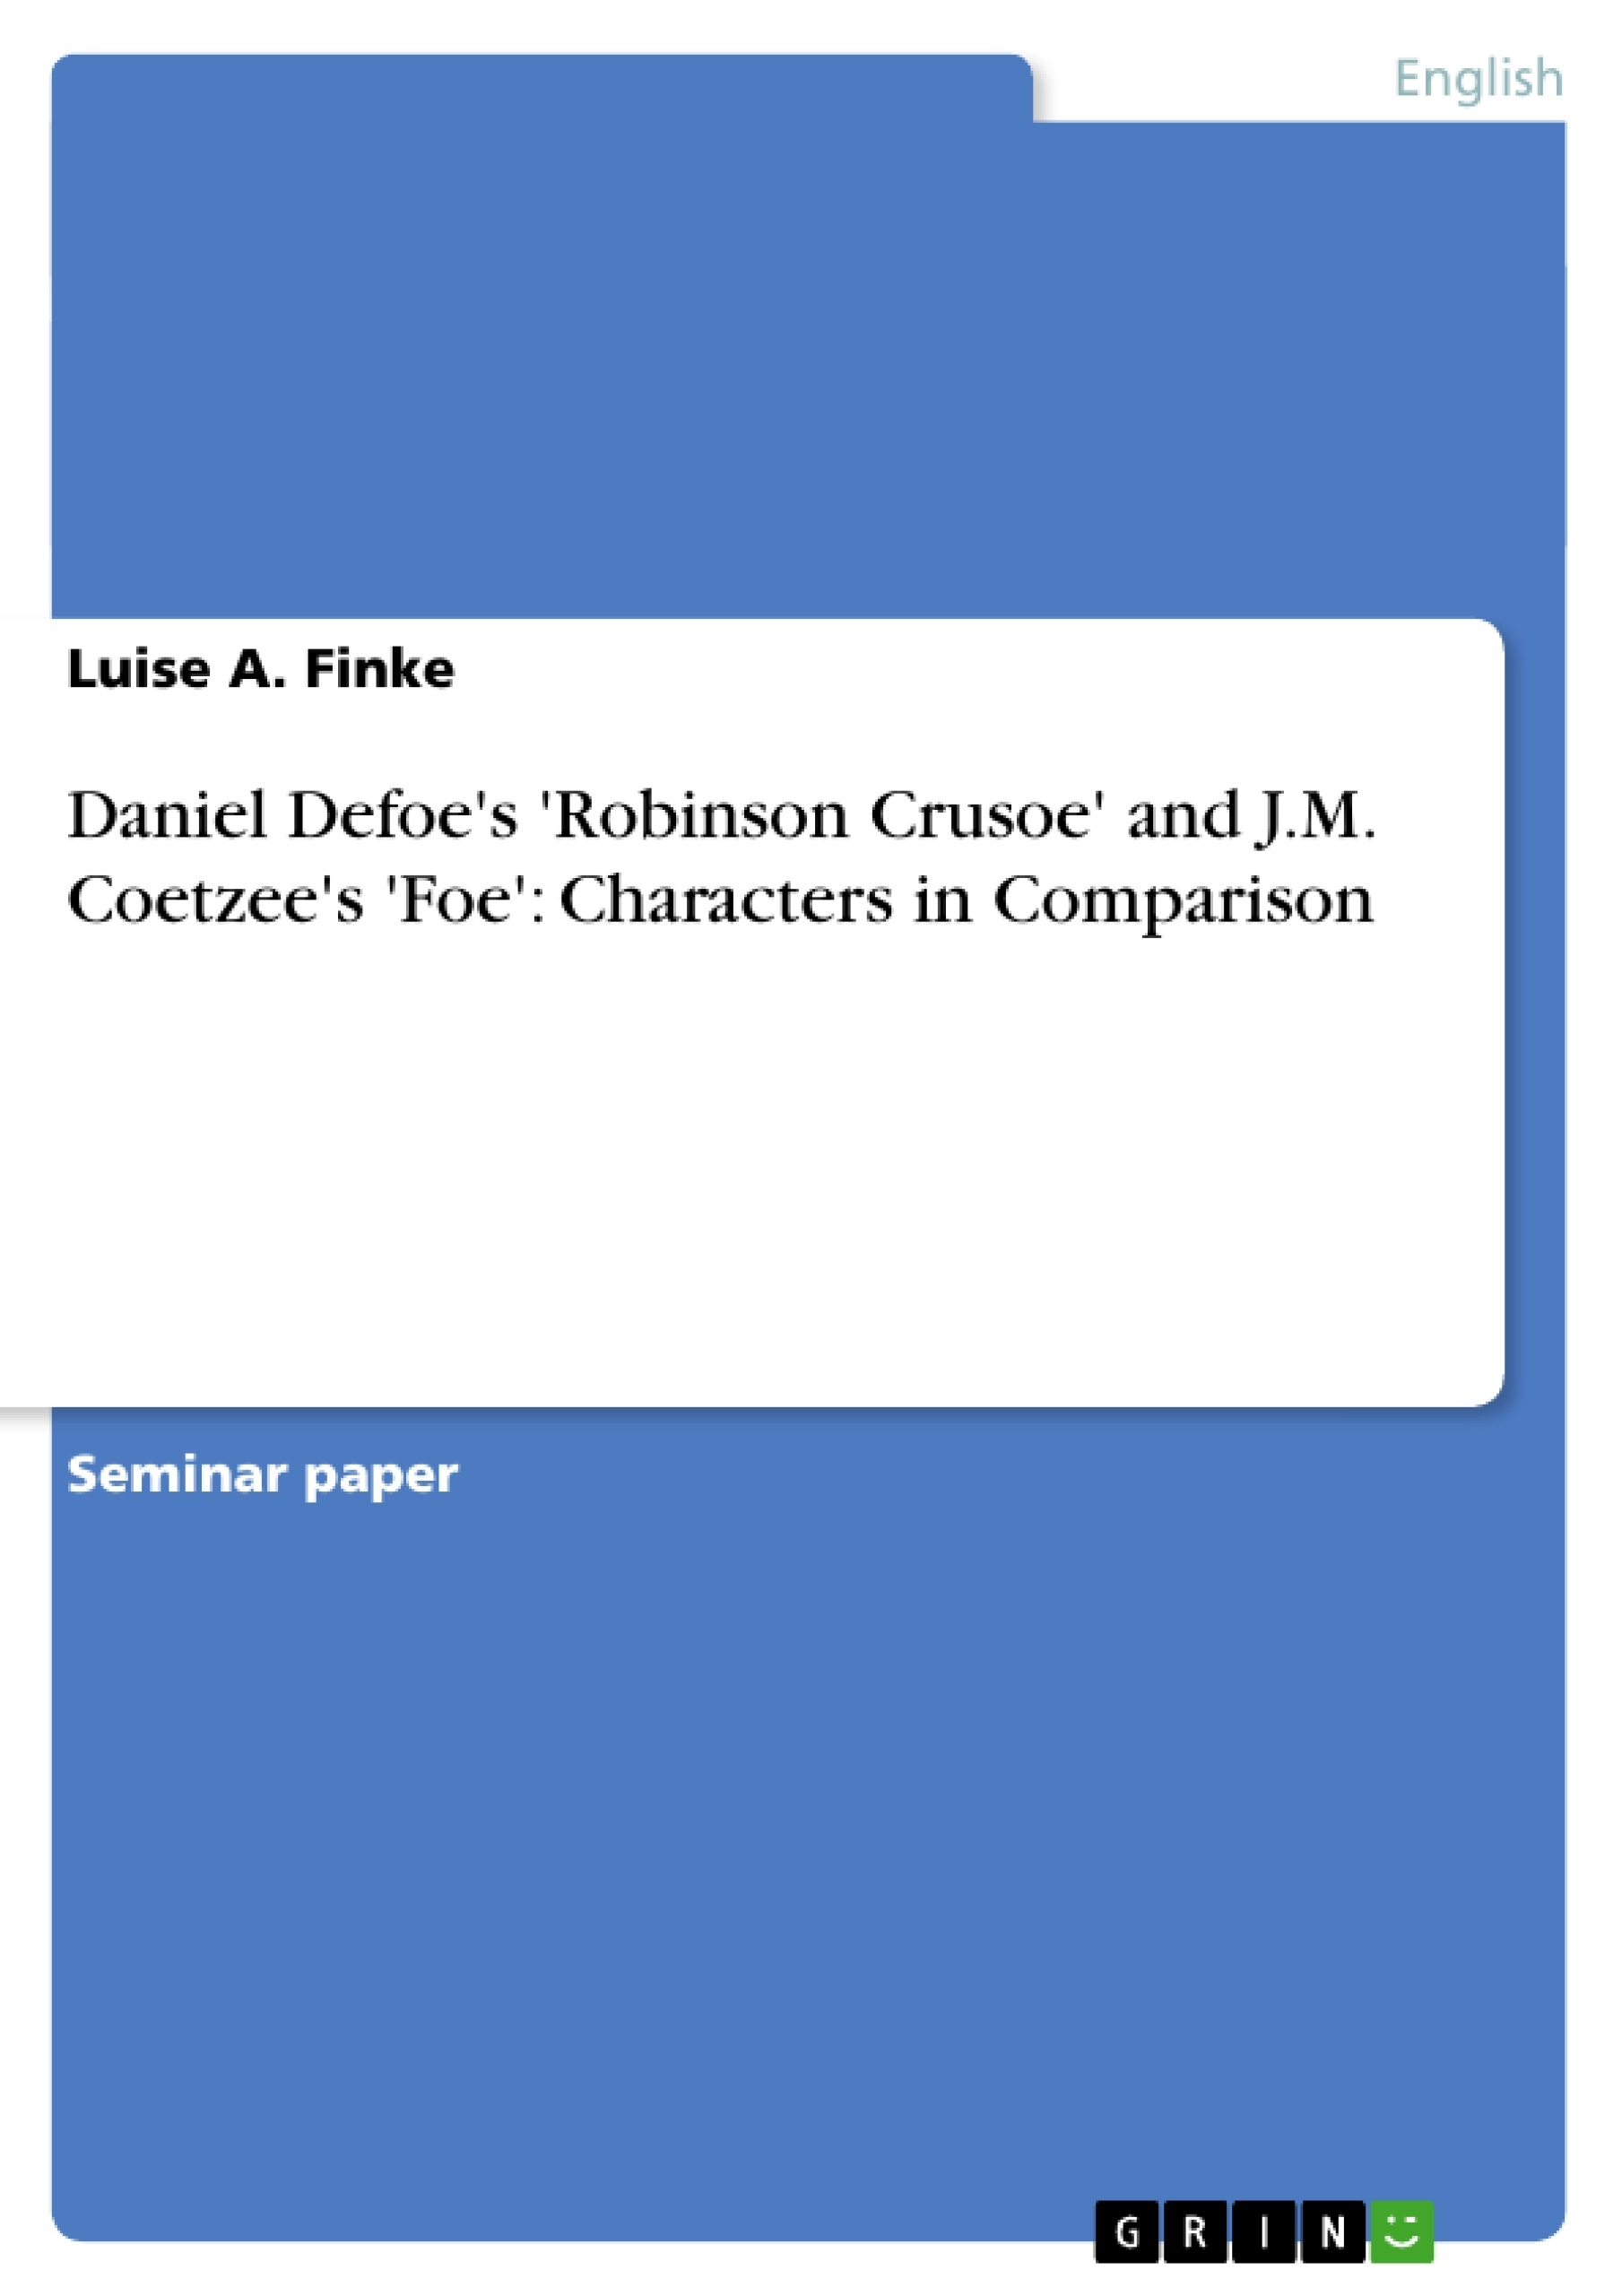 Title: Daniel Defoe's 'Robinson Crusoe' and J.M. Coetzee's 'Foe': Characters in Comparison